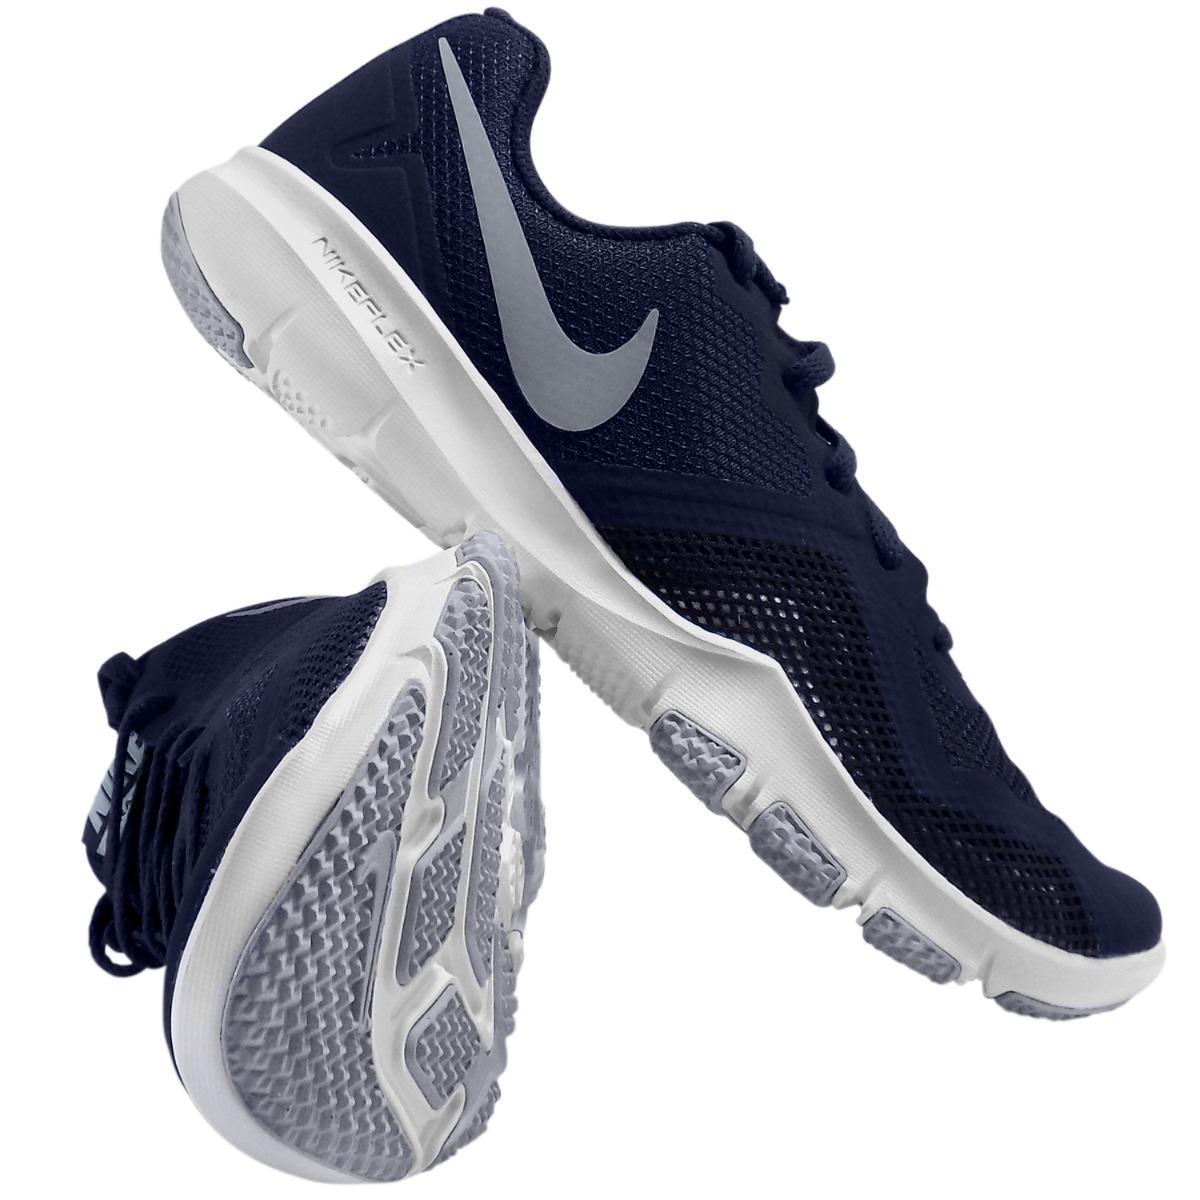 f11ee2198b Tenis Nike Flex Control Ii Training 924204-402 - $ 1,499.00 en ...